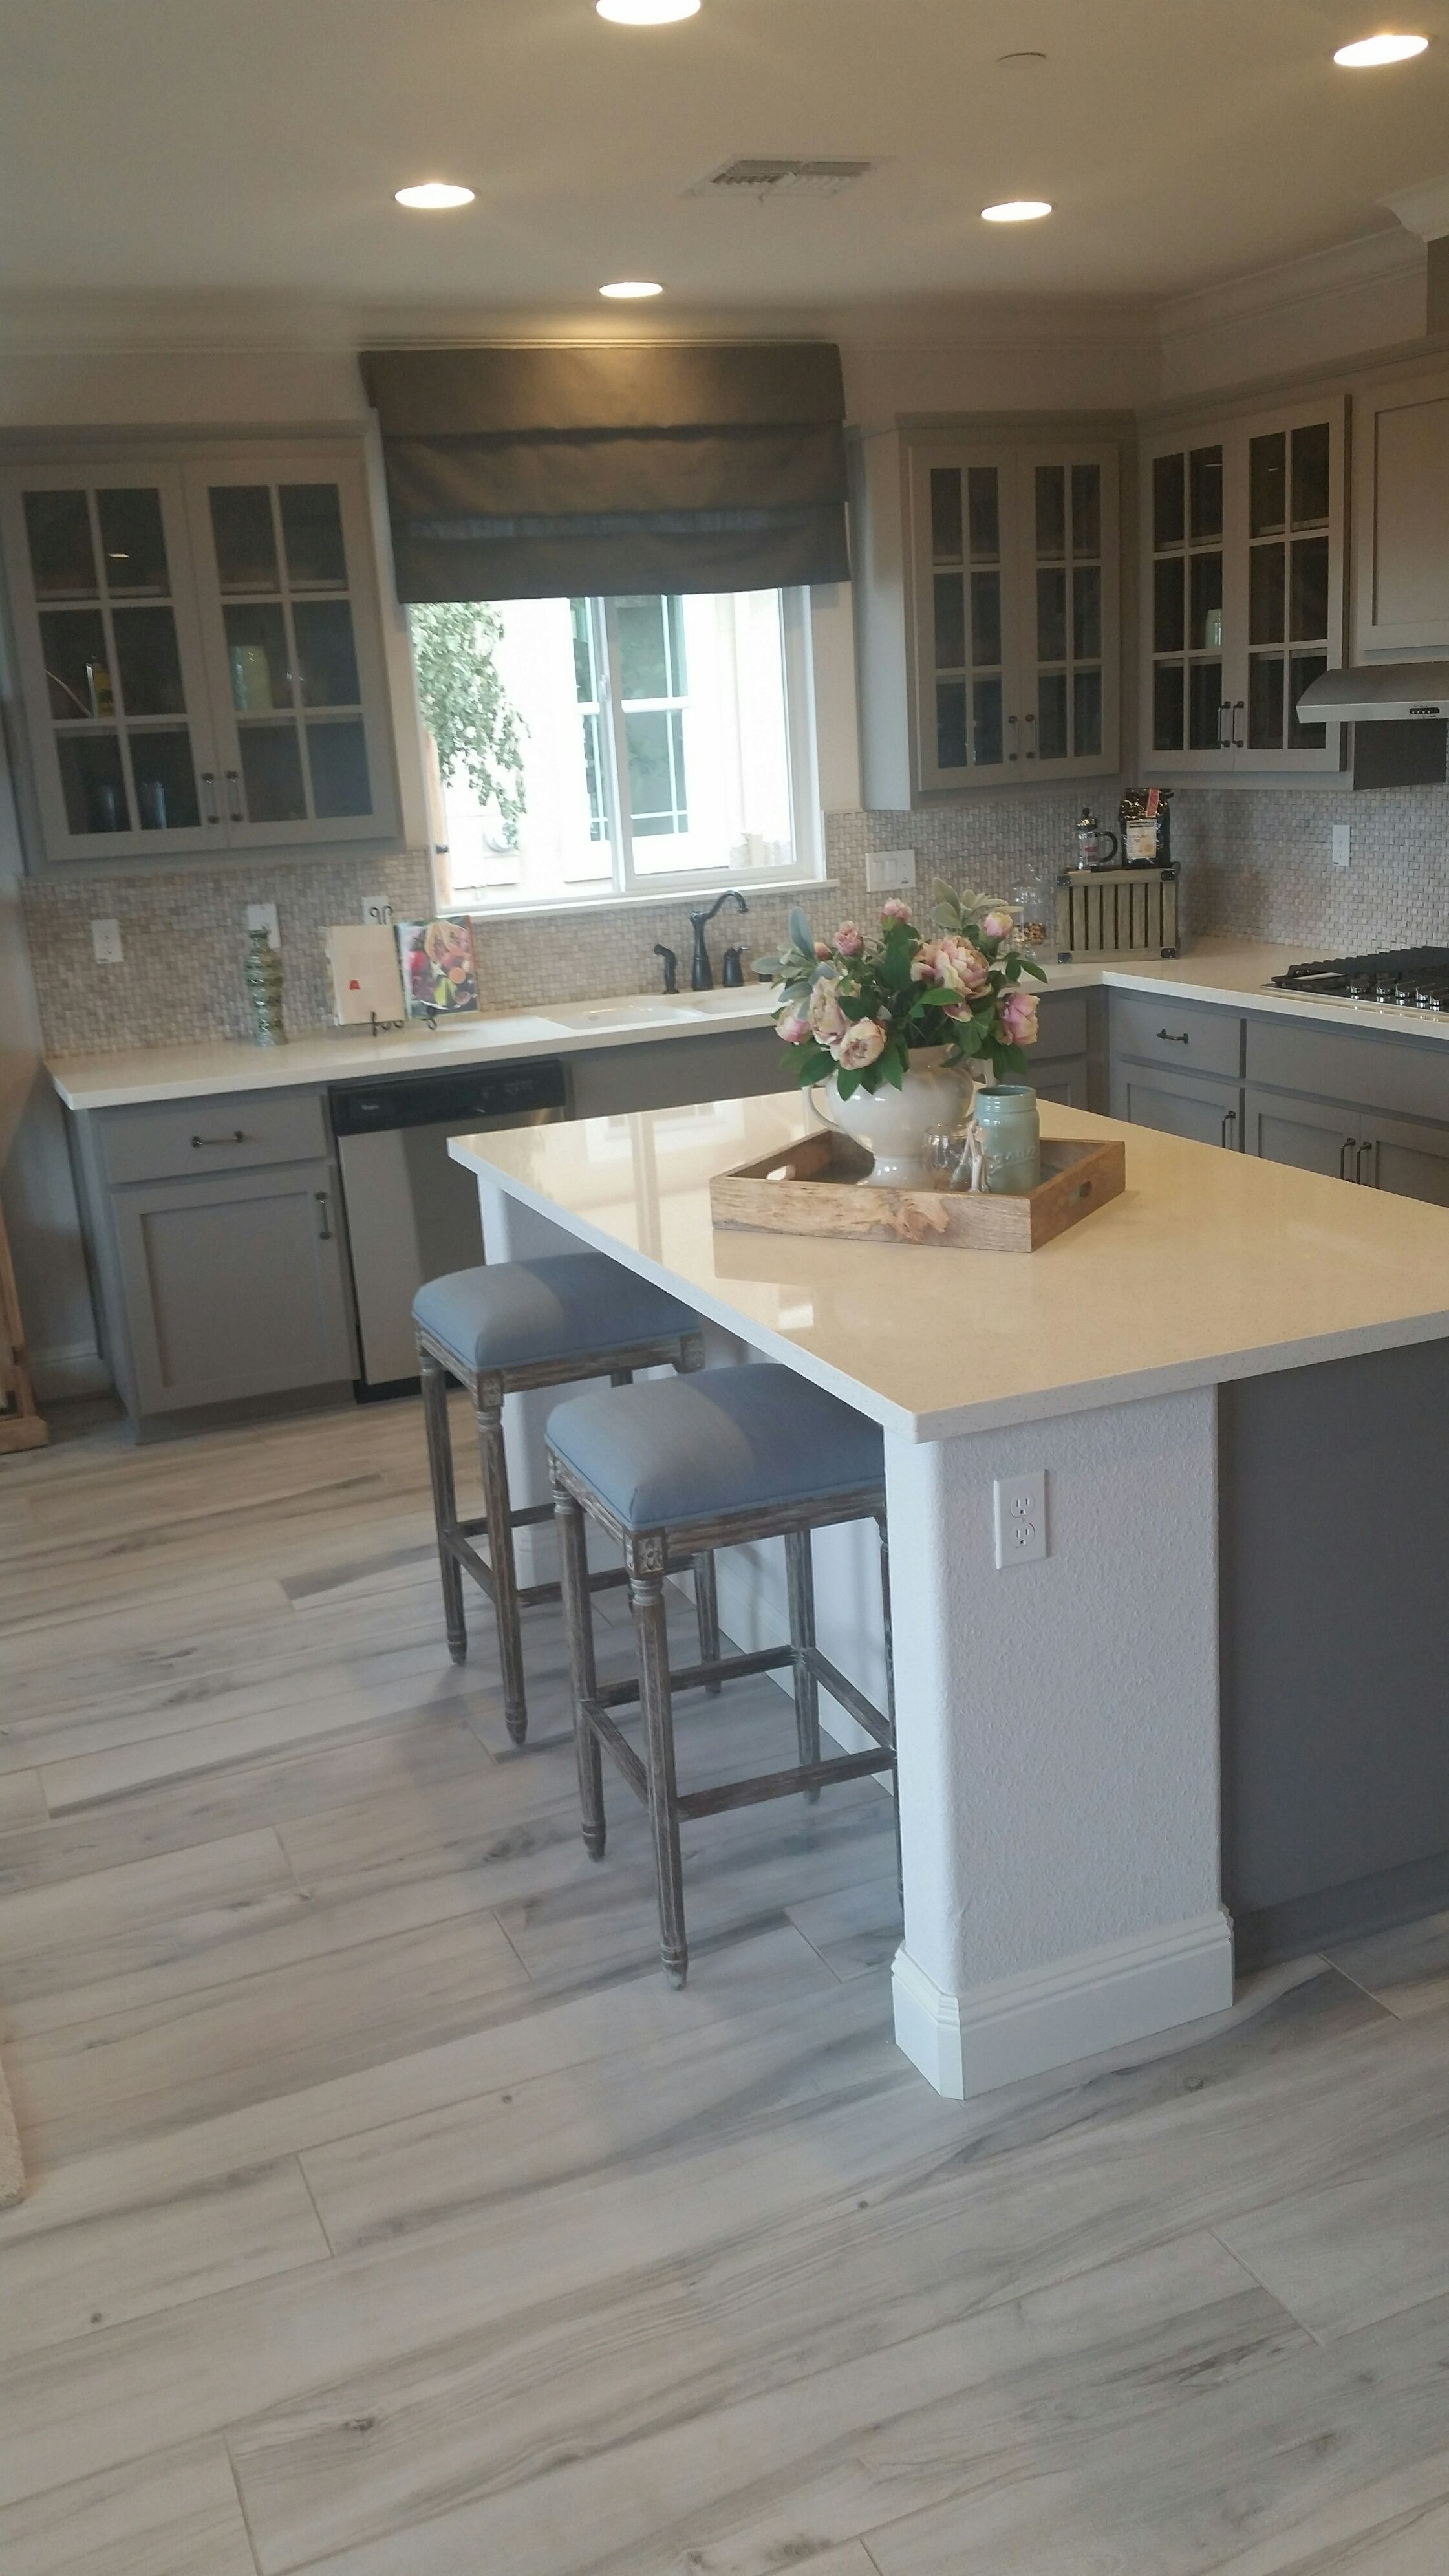 hardwood floor in kitchen Toklo by Swiss Krono Laminate My Floor Villa 12 mm Collection Home remodeling Grey and Hardwood floors